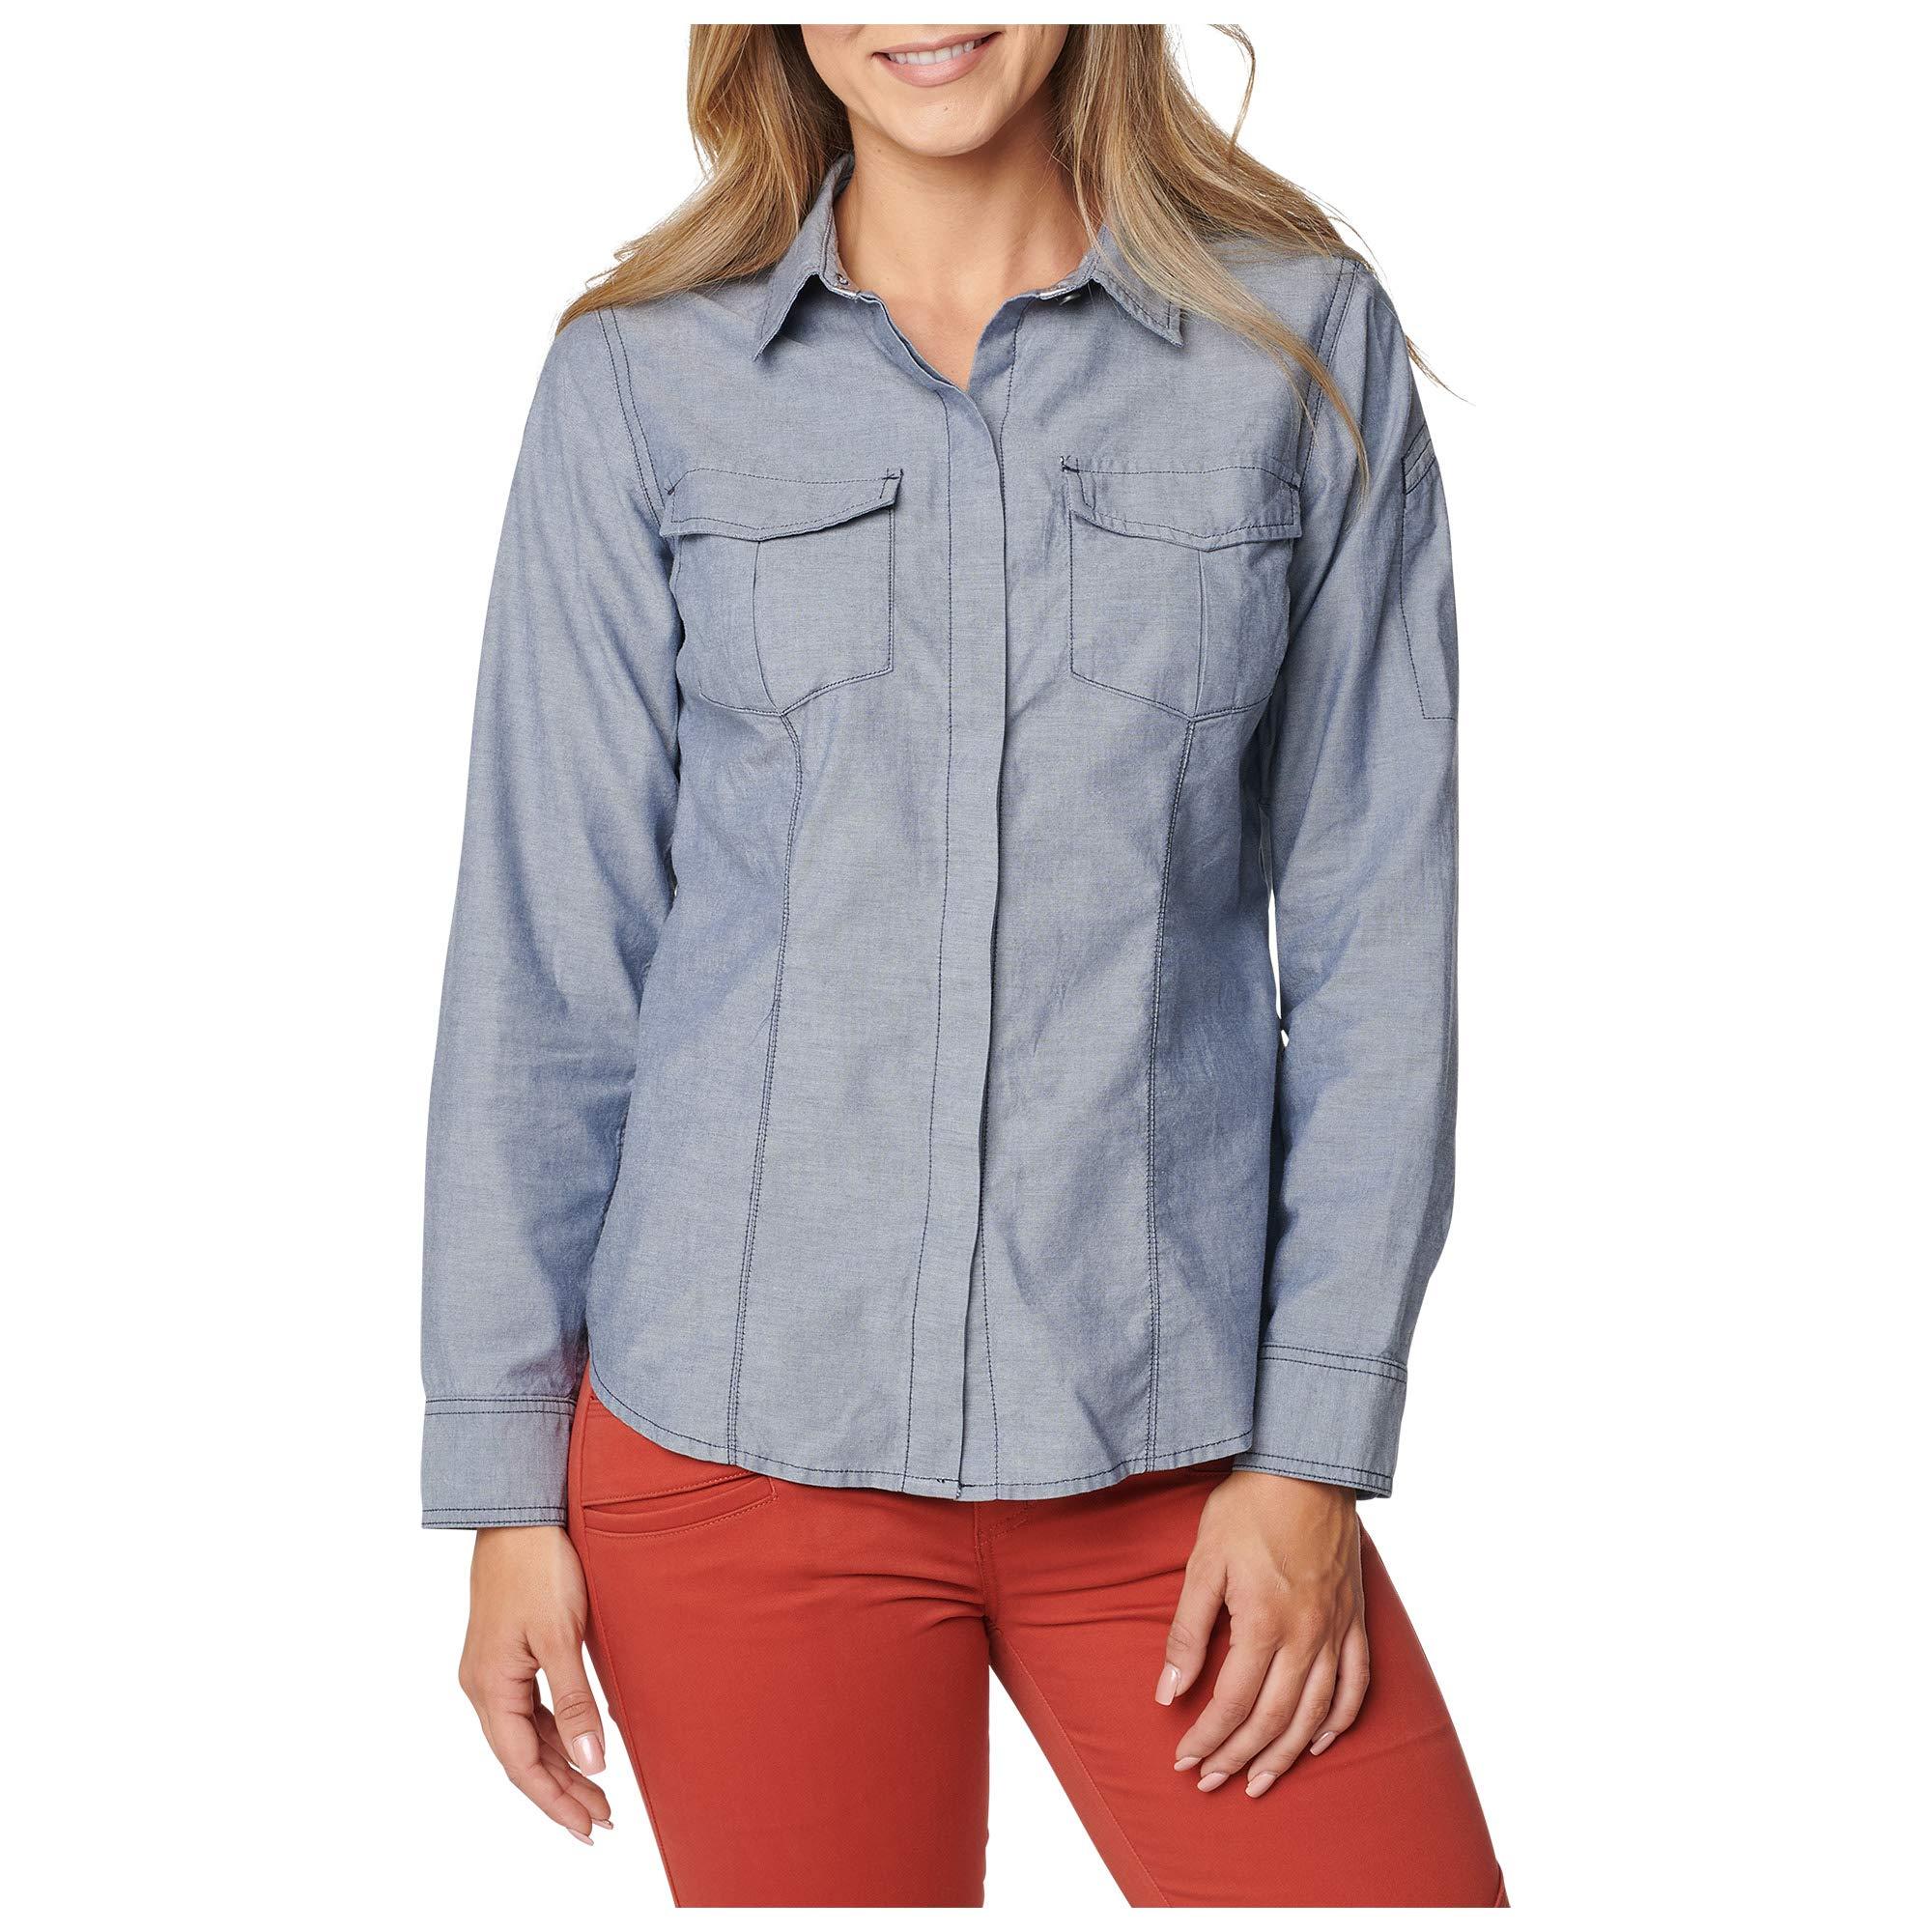 5.11 Women's Athena Long-Sleeve Shirt Night Watch (L)